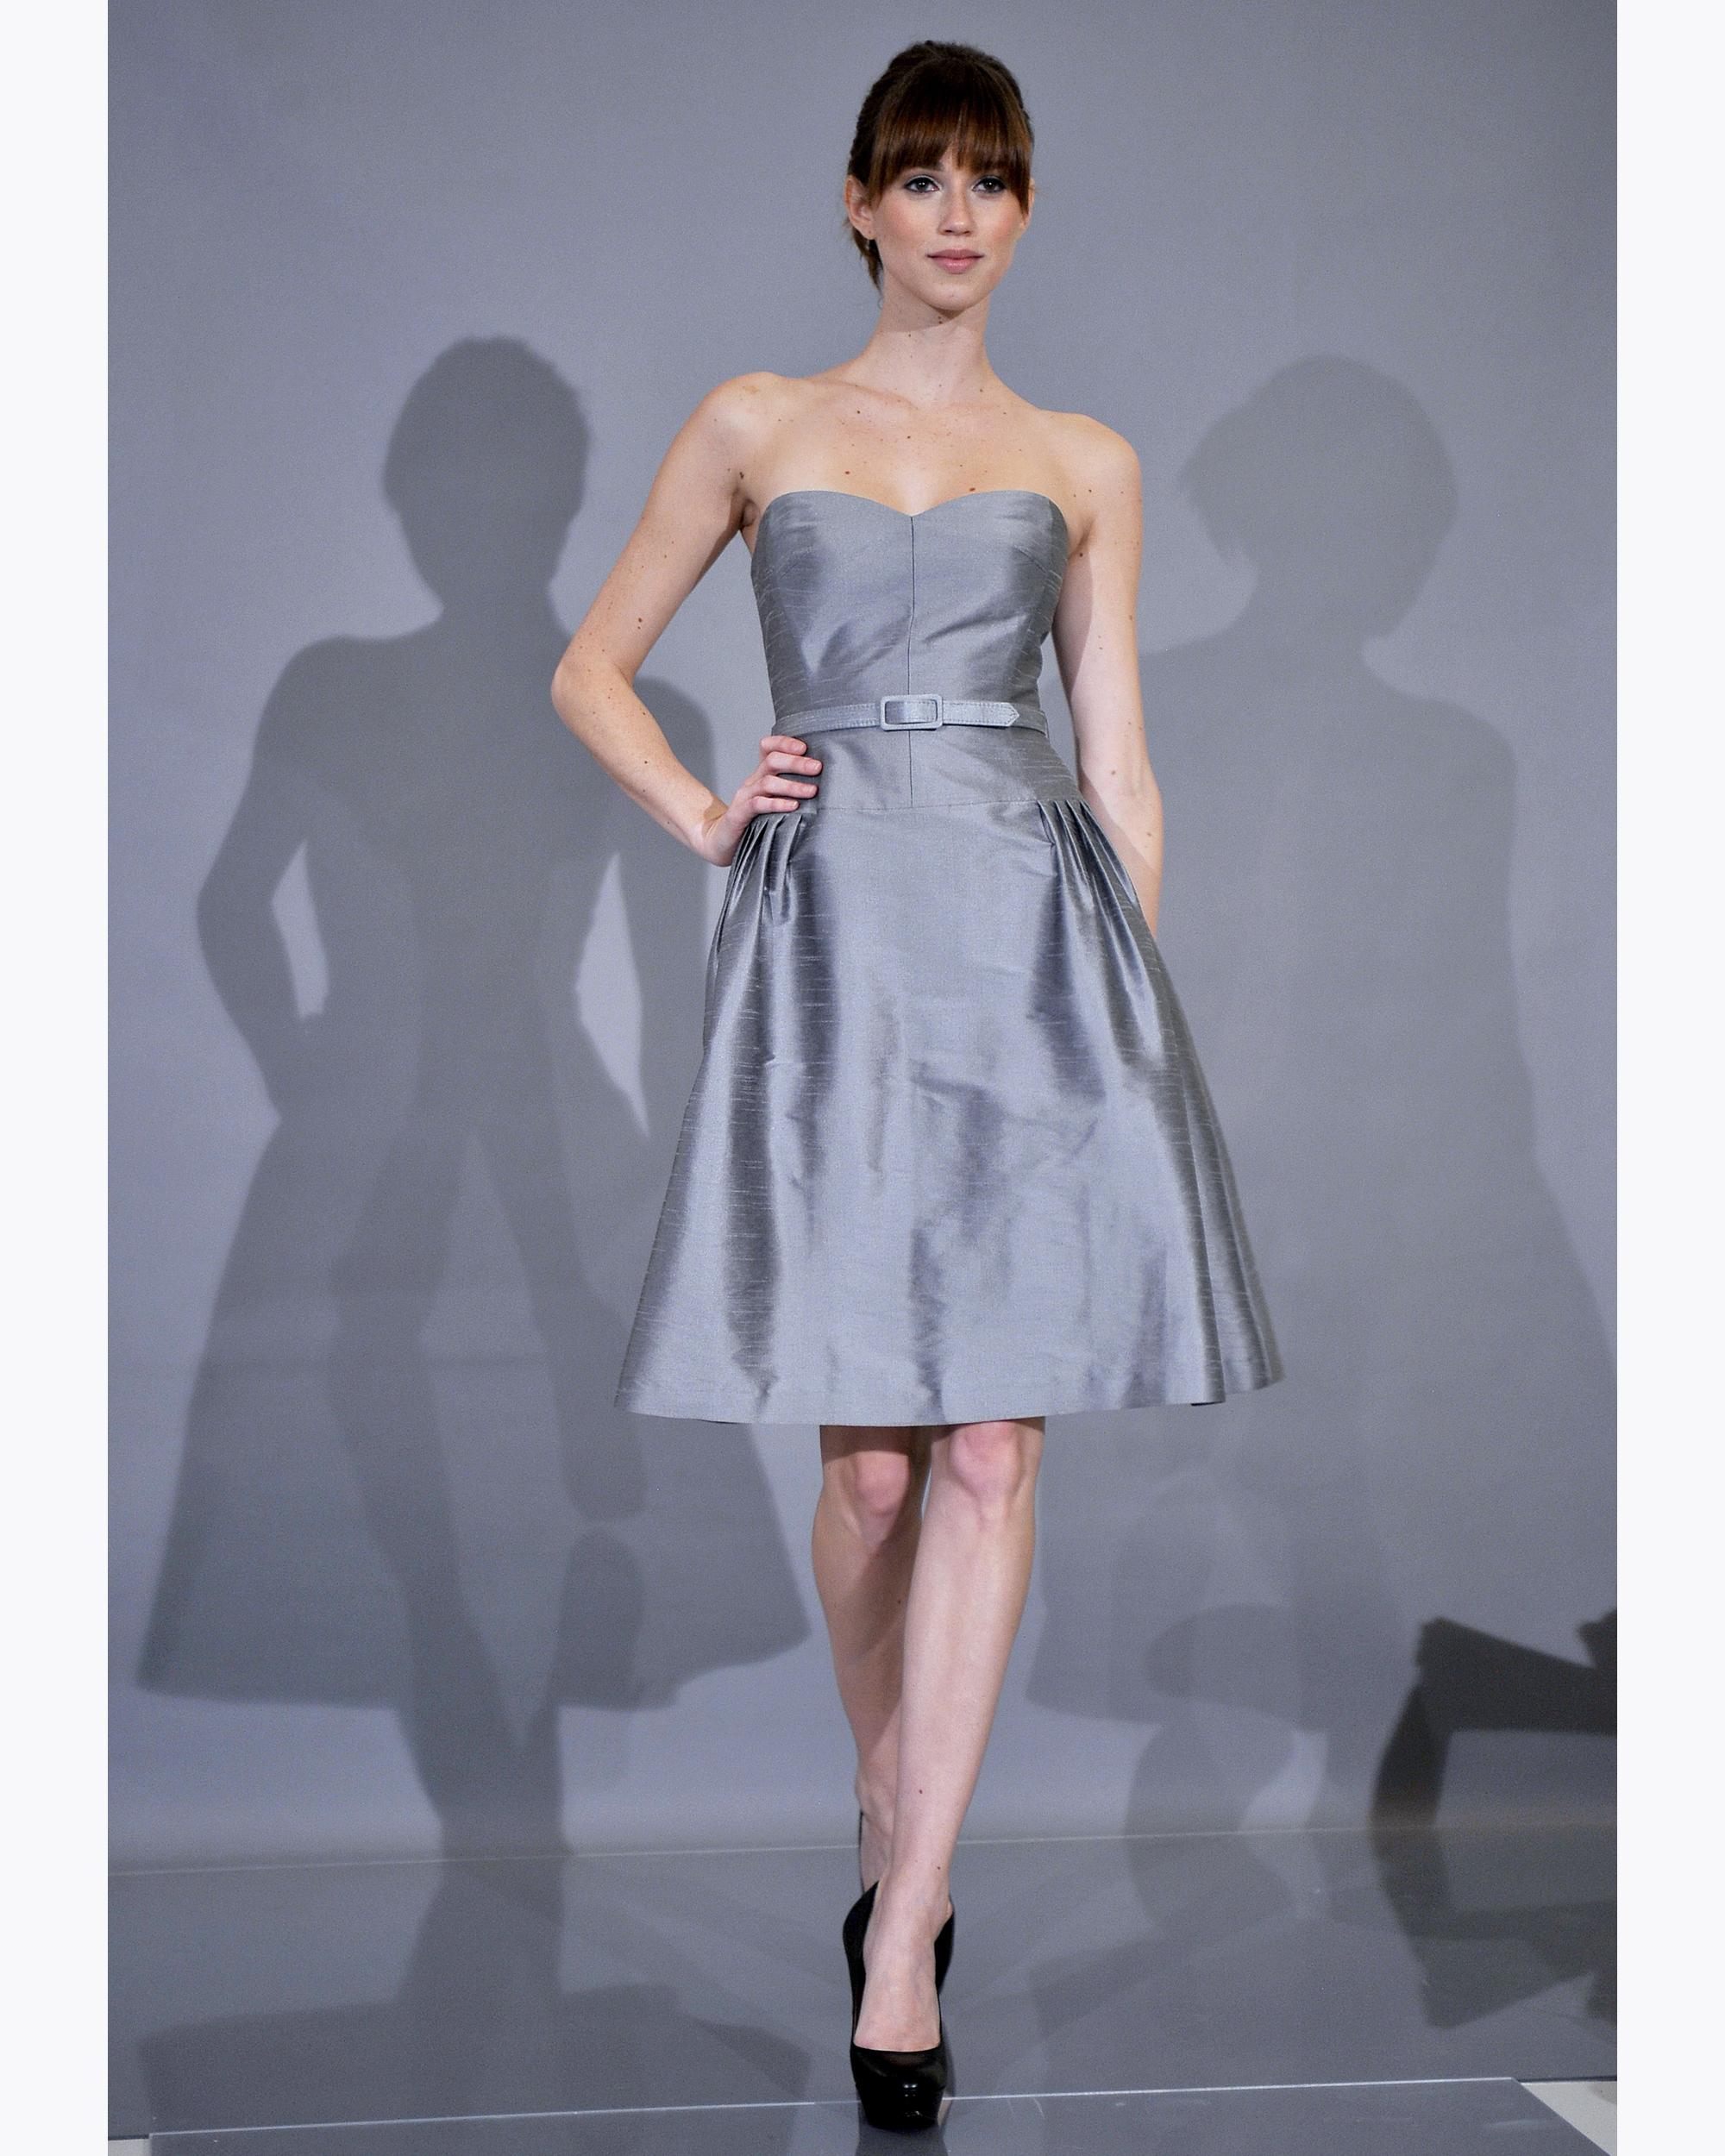 monique-lhuillier-bridesmaids-fall2012-wd108109-002.jpg